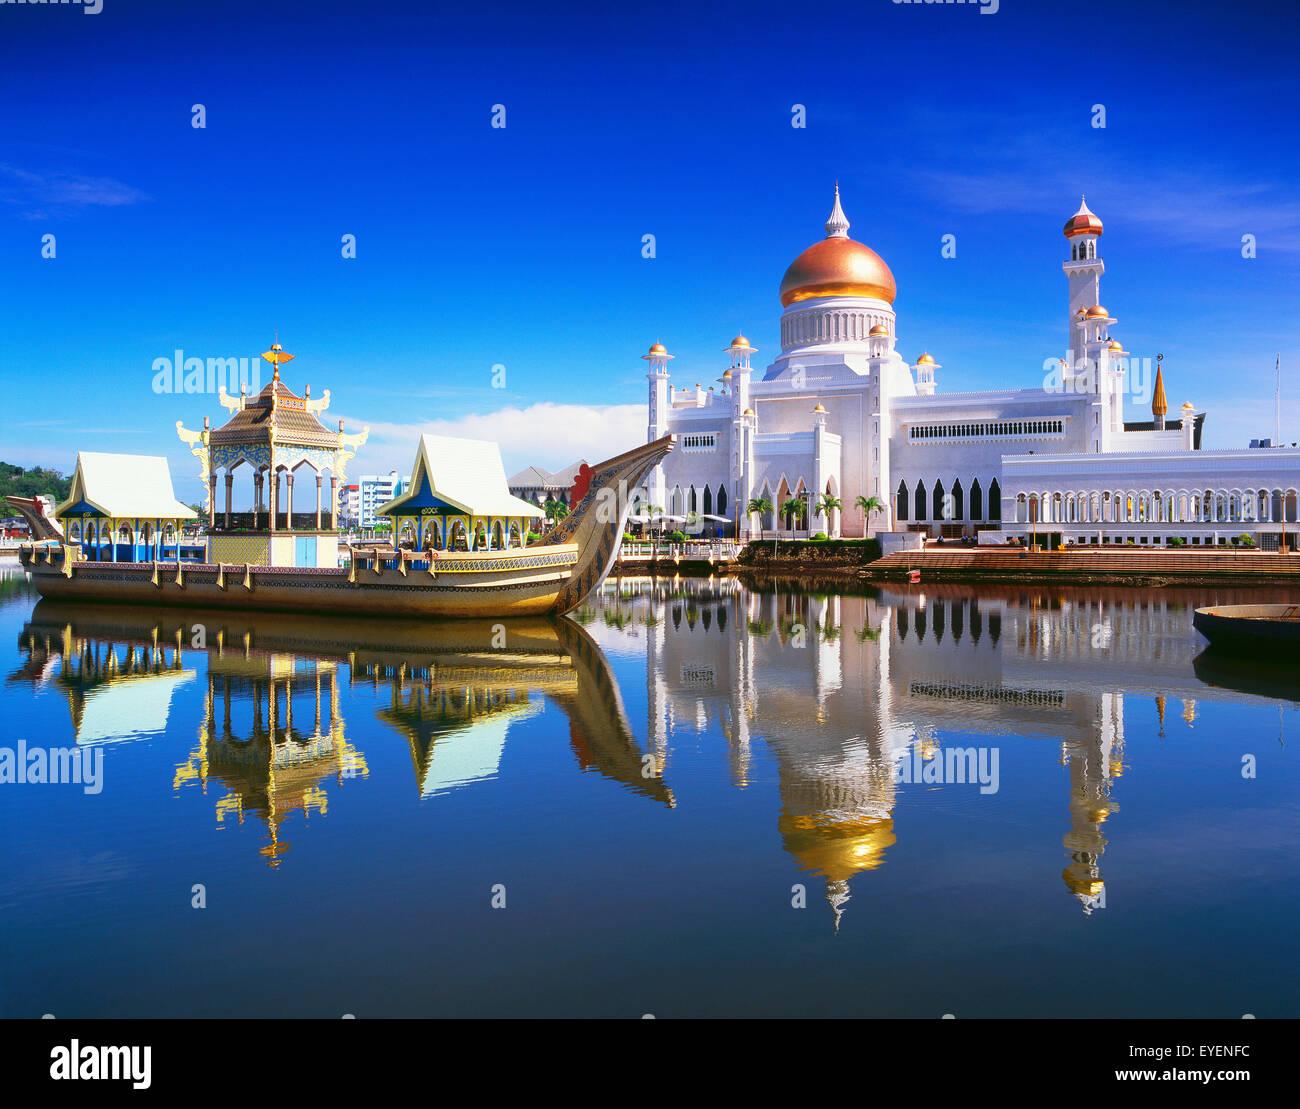 Sultan Omar Ali Saifuddien Mosque; Bandar Seri Begawan, Brunei - Stock Image